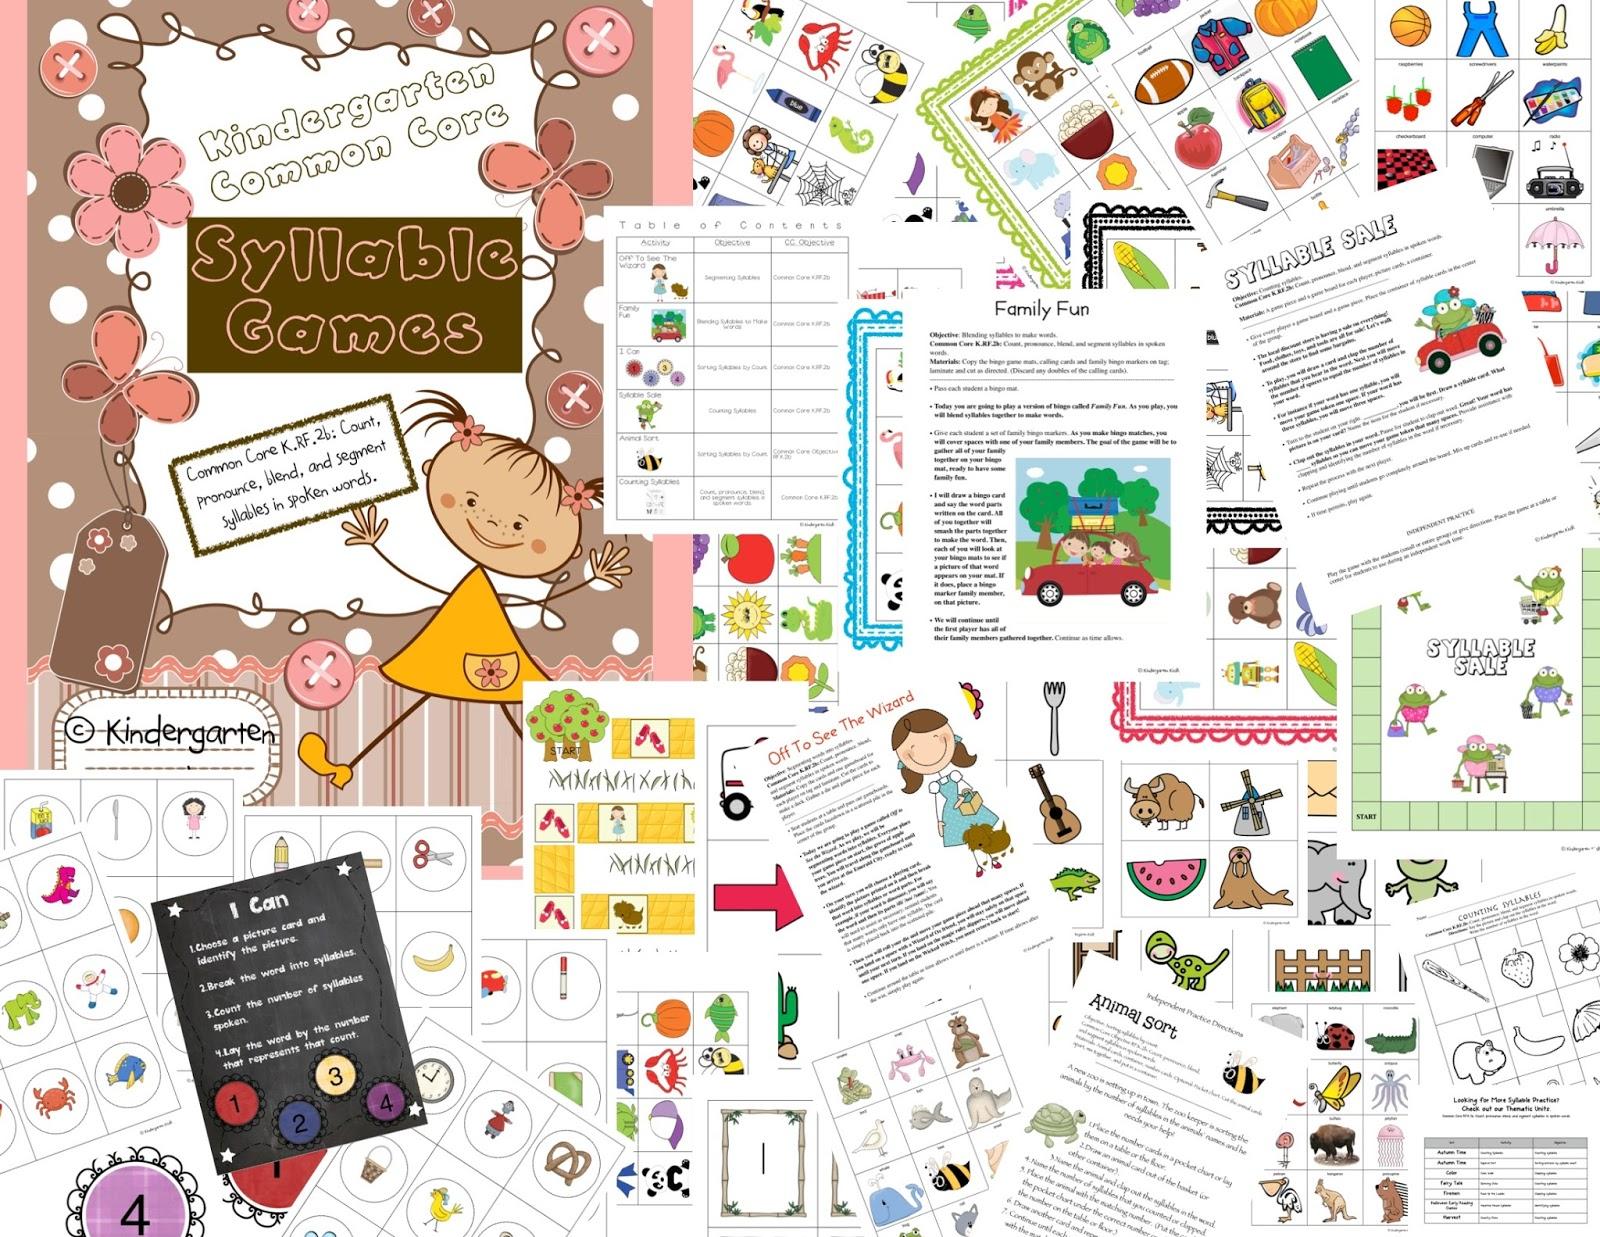 Kindergarten Worksheet On Syllables